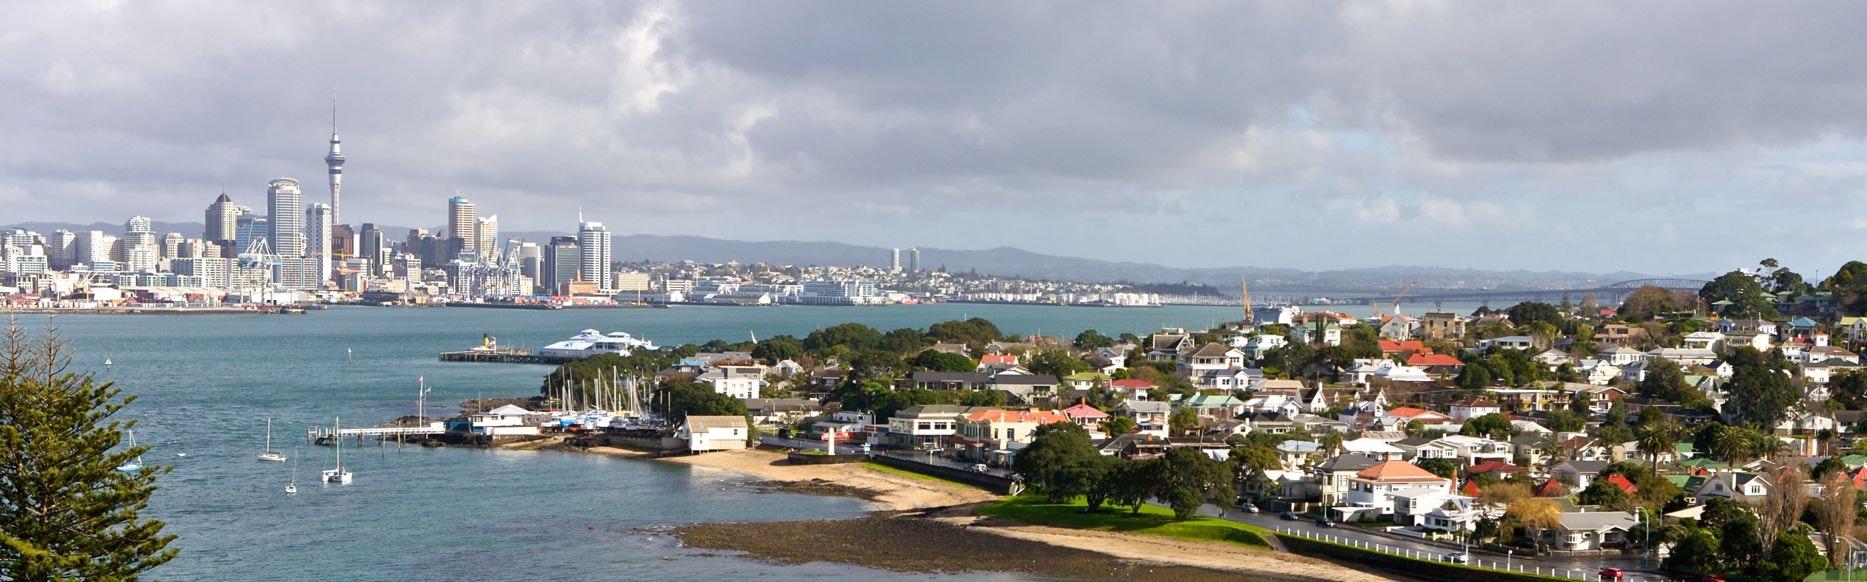 Schüleraustausch Neuseeland Auckland Orientation